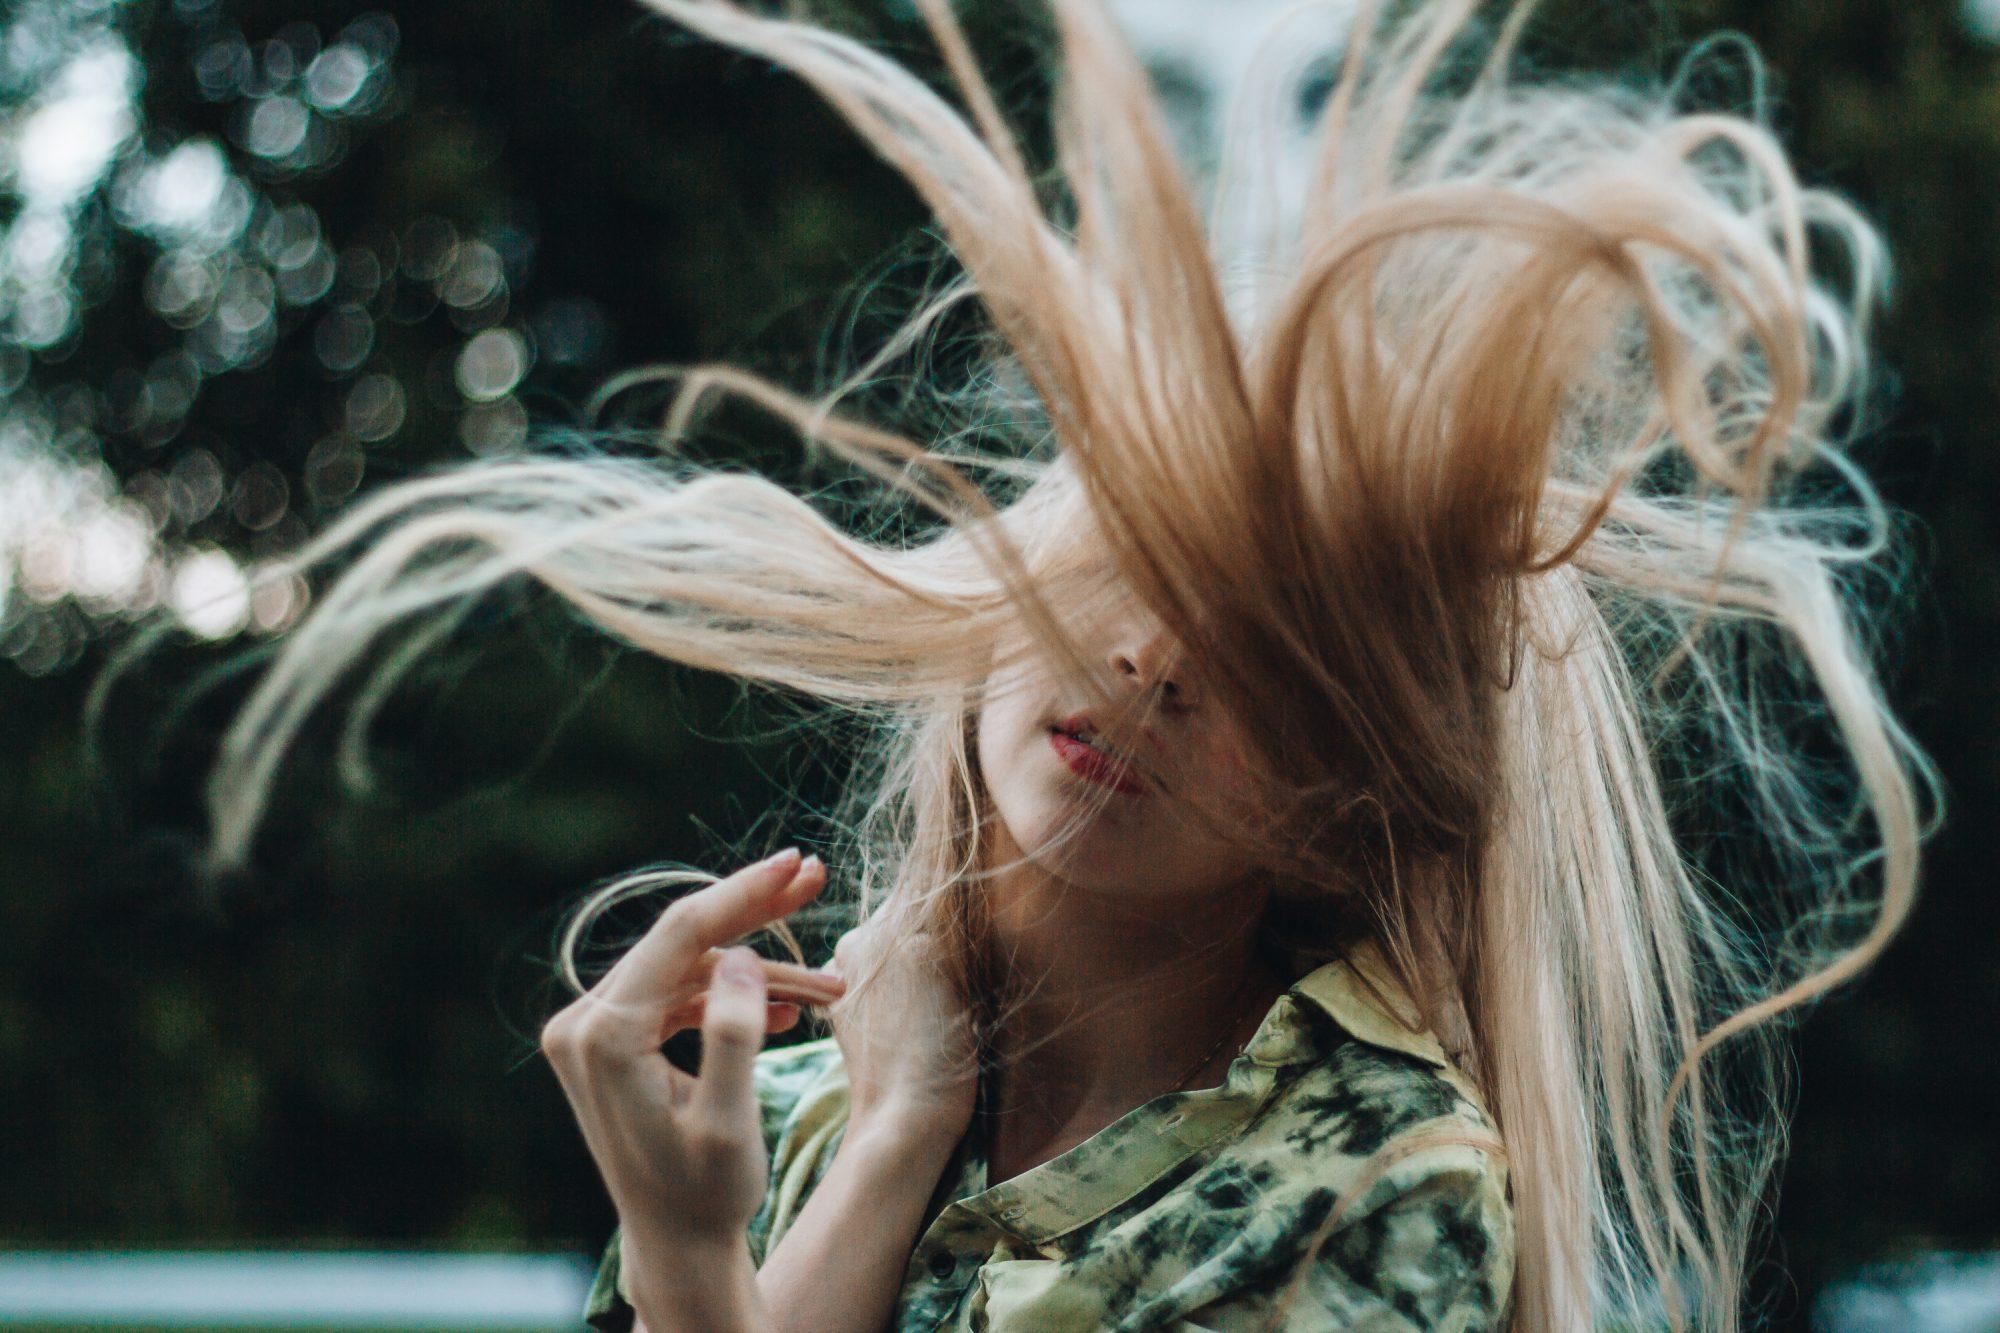 maschera per capelli in autunno